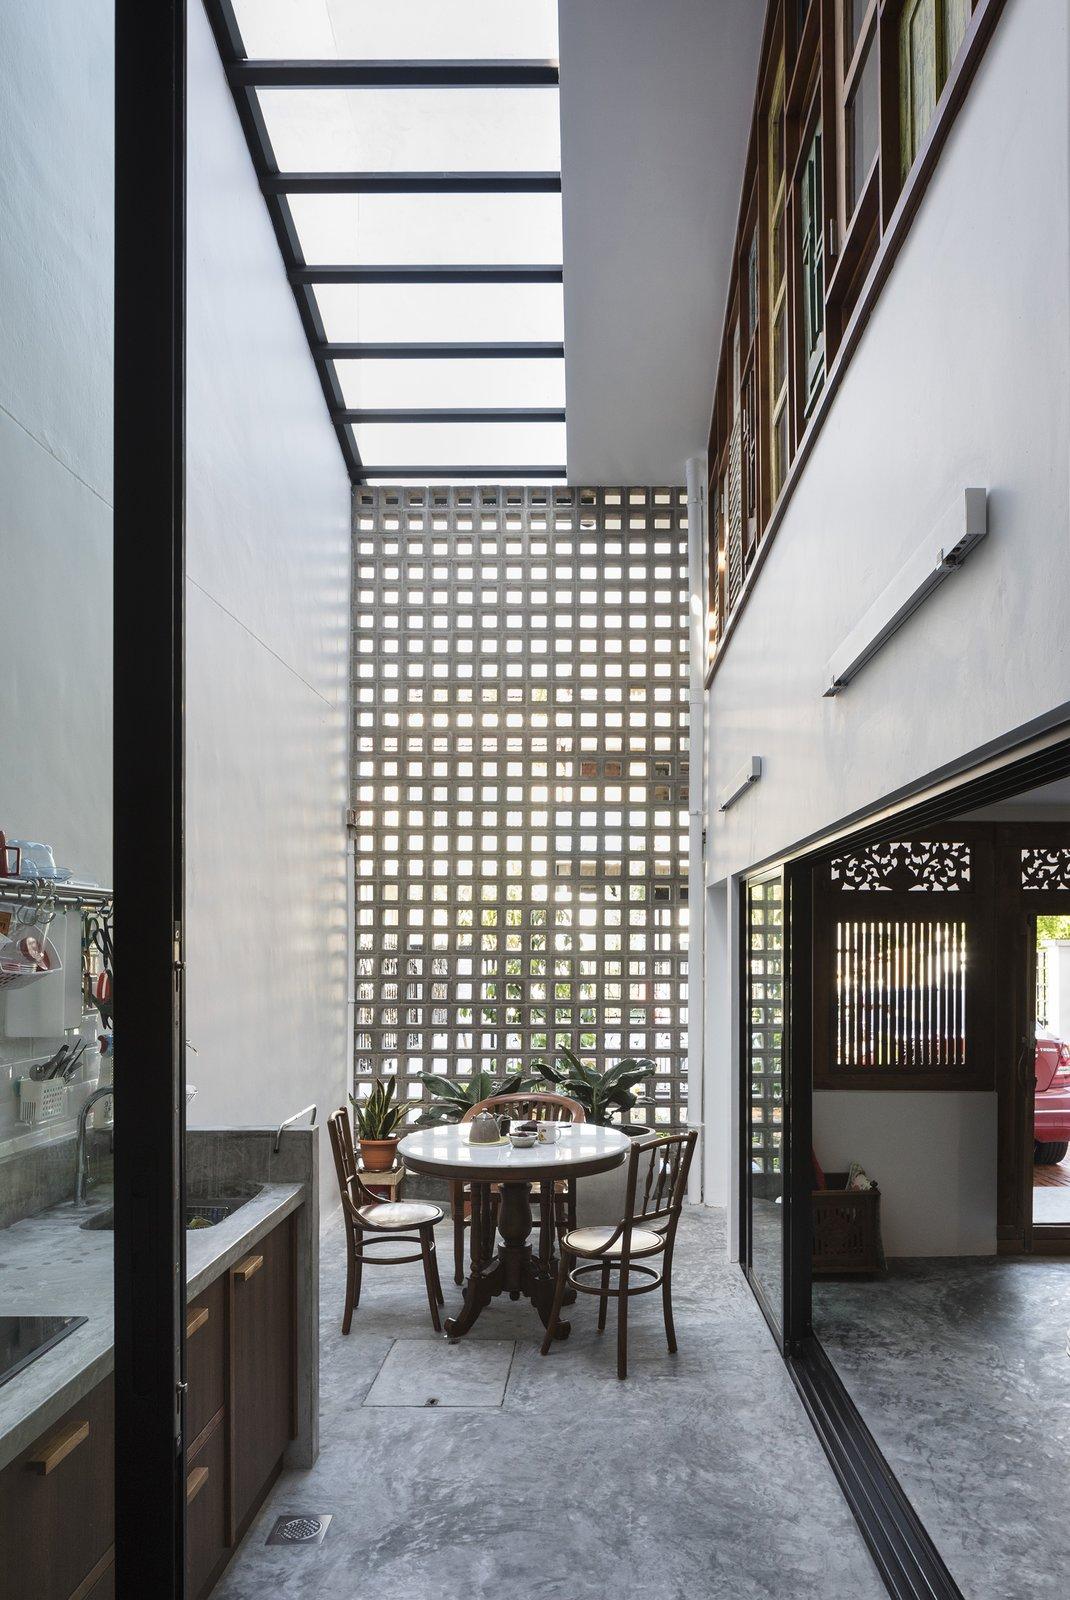 Heng House by Goy Architects, Tropical Living, Concrete Breezeblocks, Skylight, Upcycling, Timber Windows, Asian Kitchen